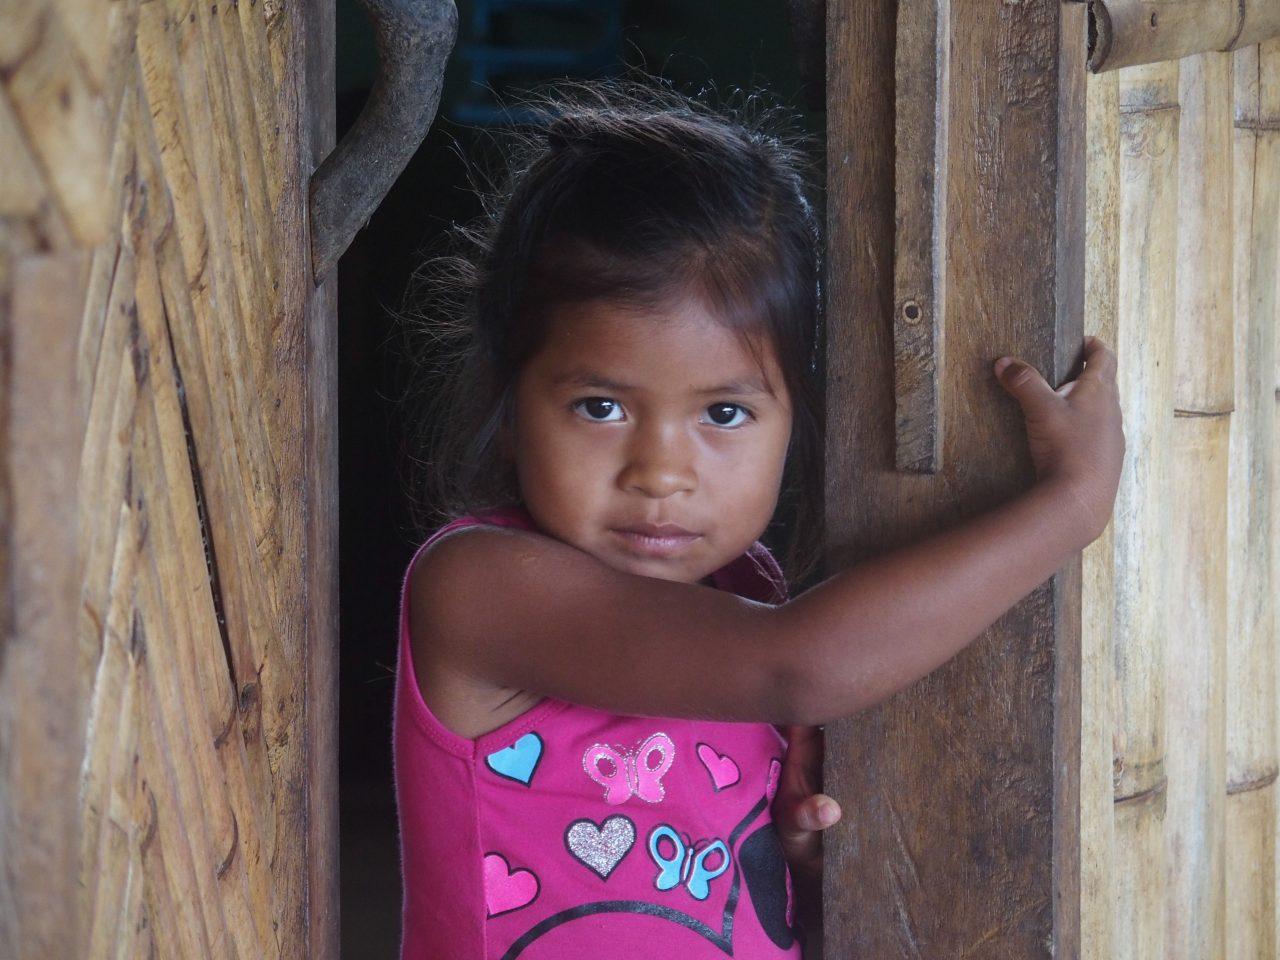 Jolie petite fille au sasha lodge Amazonie Equateur